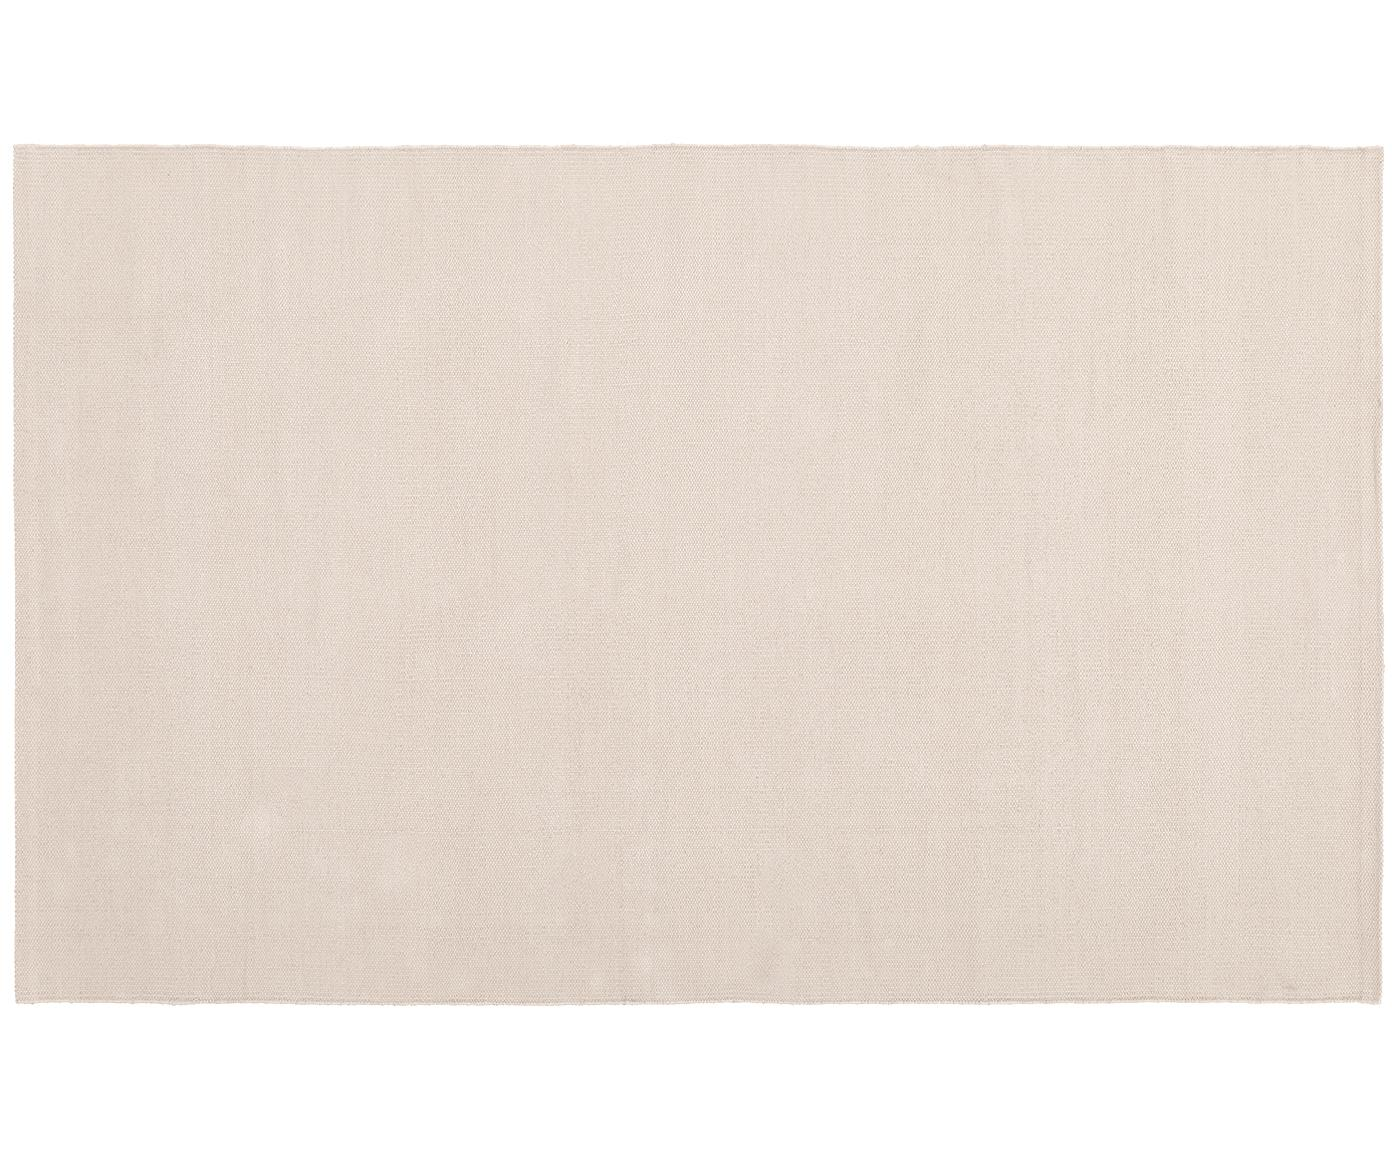 Dünner Baumwollteppich Agneta, handgewebt, 100% Baumwolle, Beige, B 50 x L 80 cm (Grösse XXS)